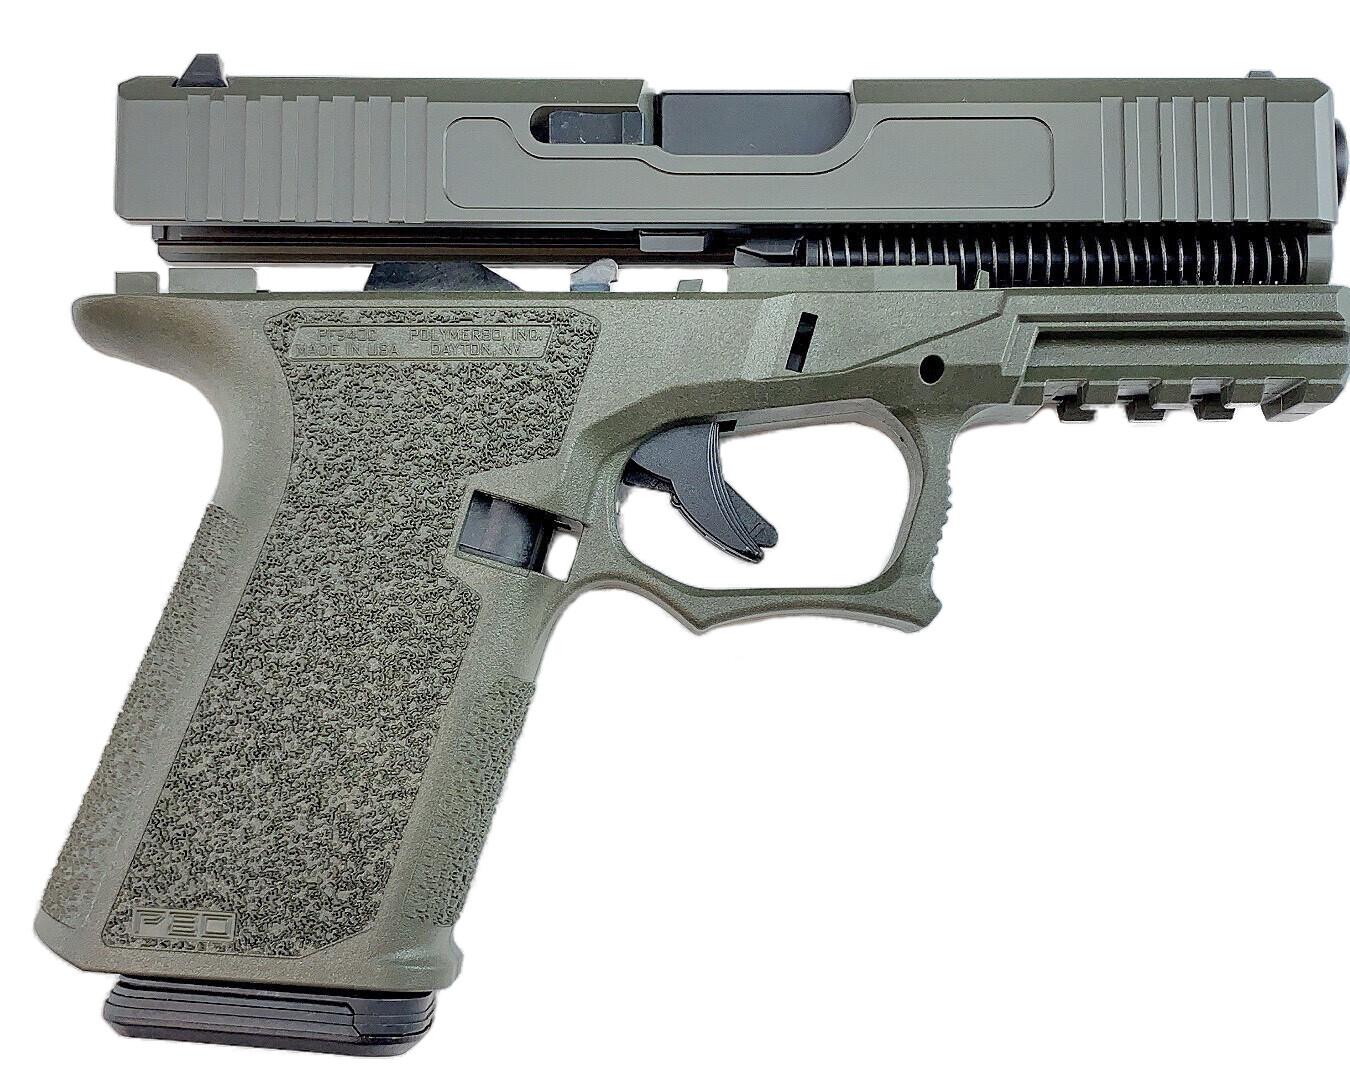 Patriot G19 80% Pistol Build Kit 9mm - Polymer80 PF940C - OD Green